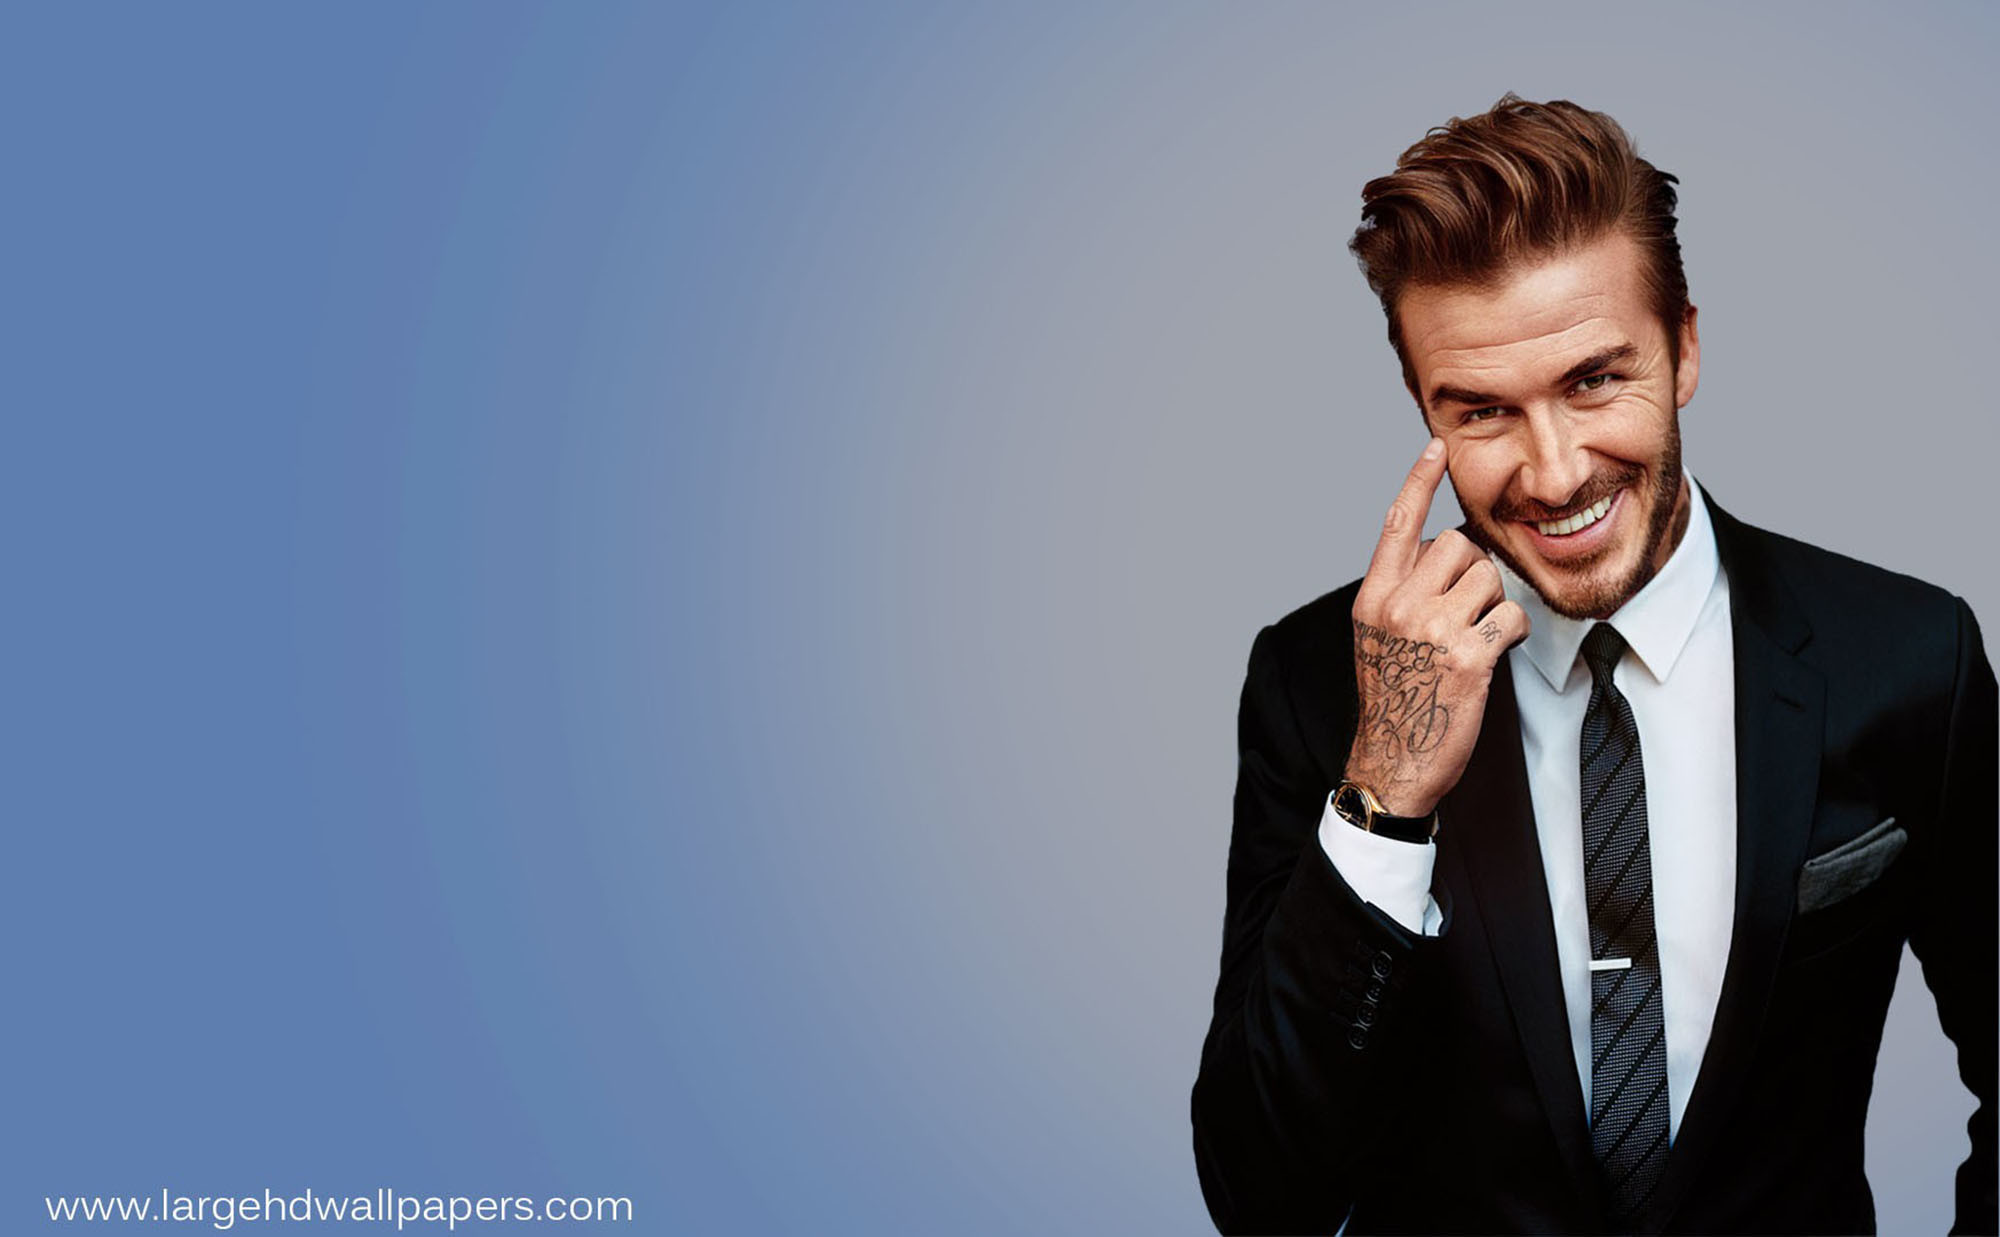 Res: 2000x1237, Backgrounds Of David Beckham Photo Hd New Stills In Wallpaper Computer